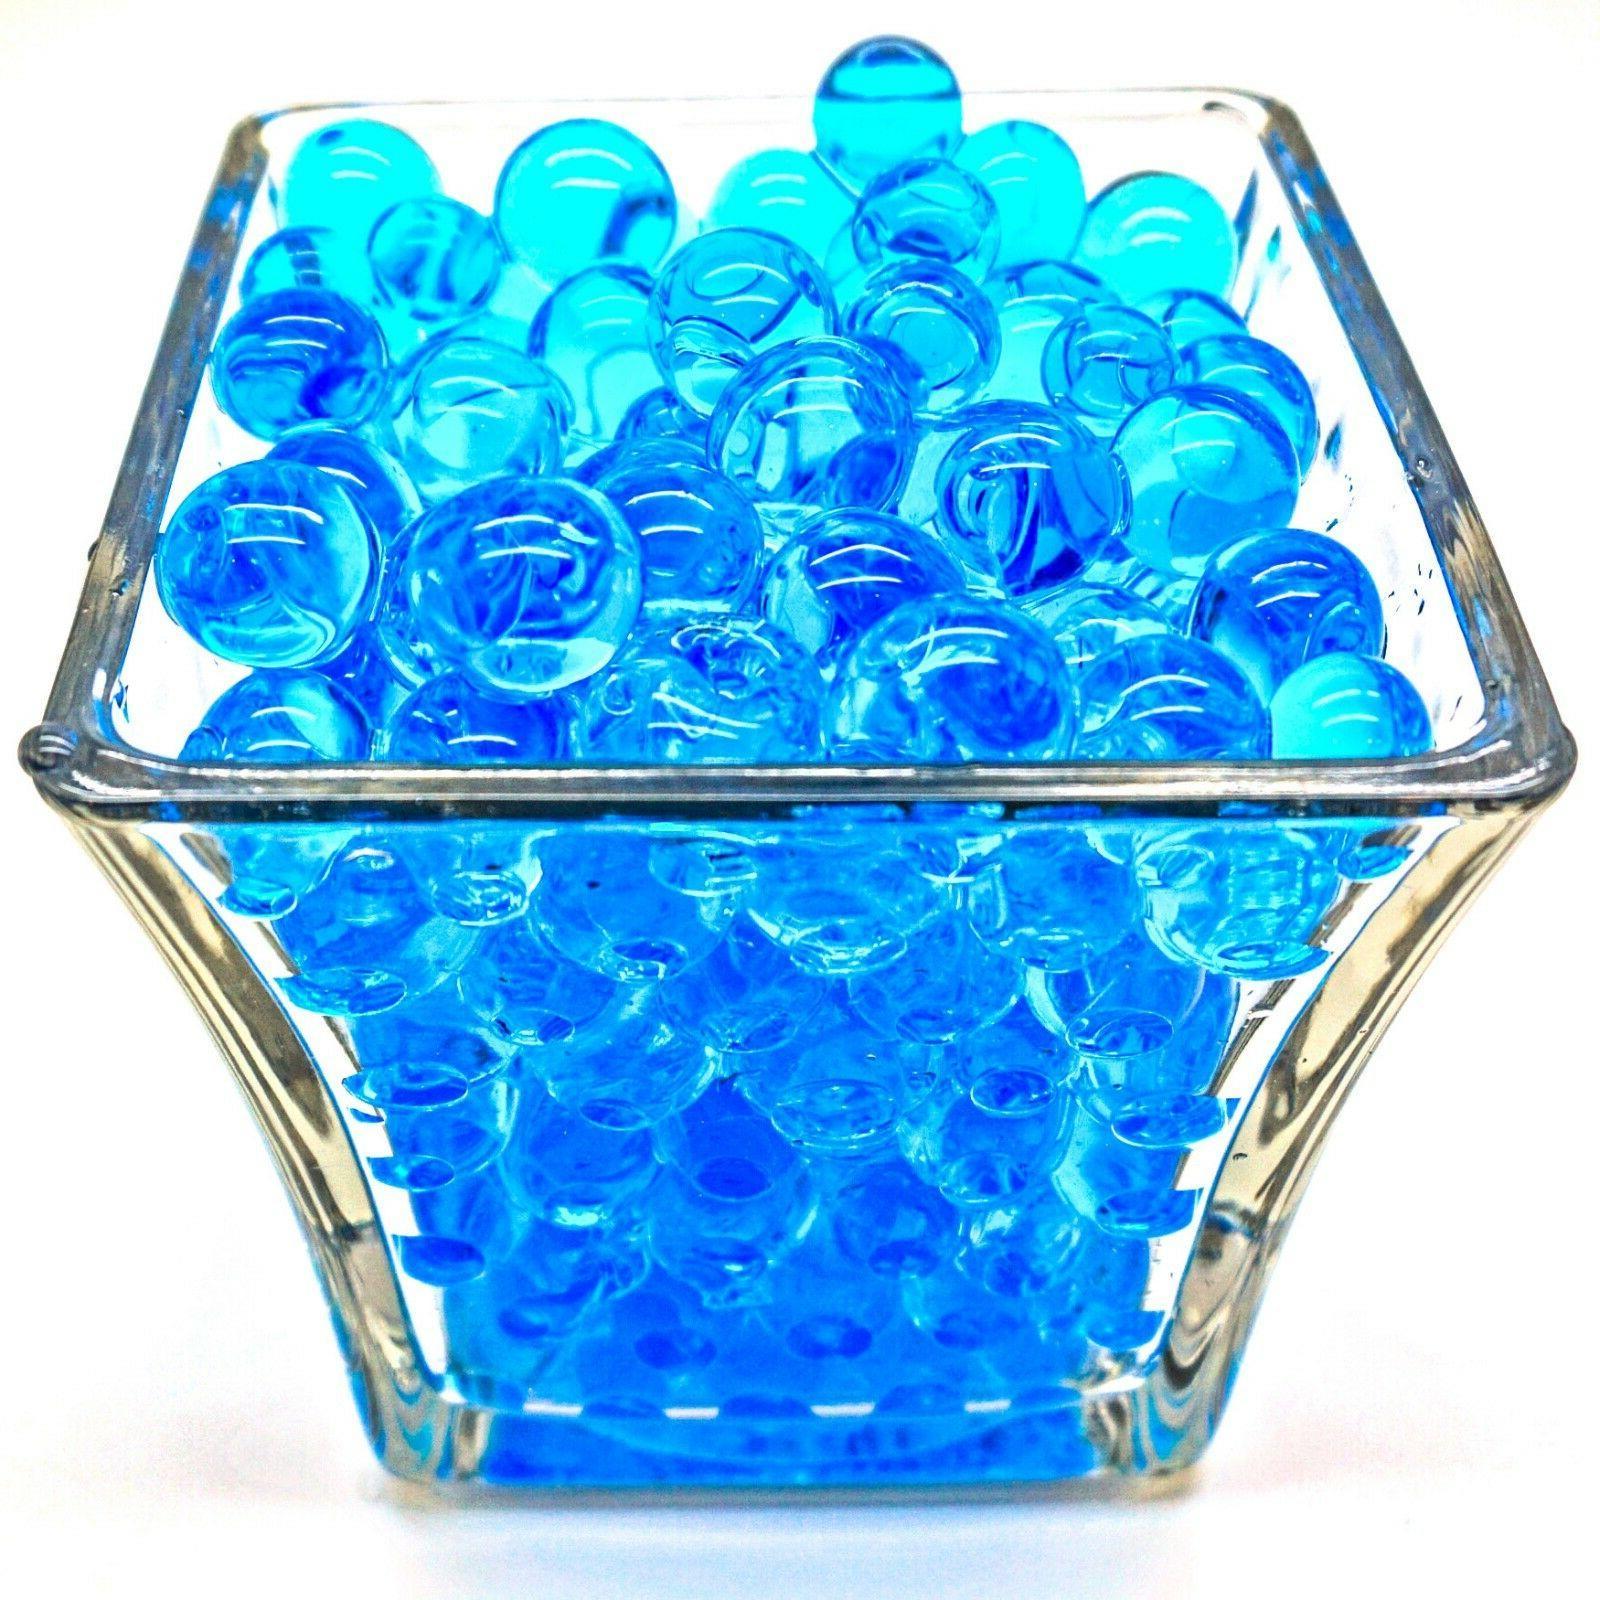 Vase Filler Gel Water Beads